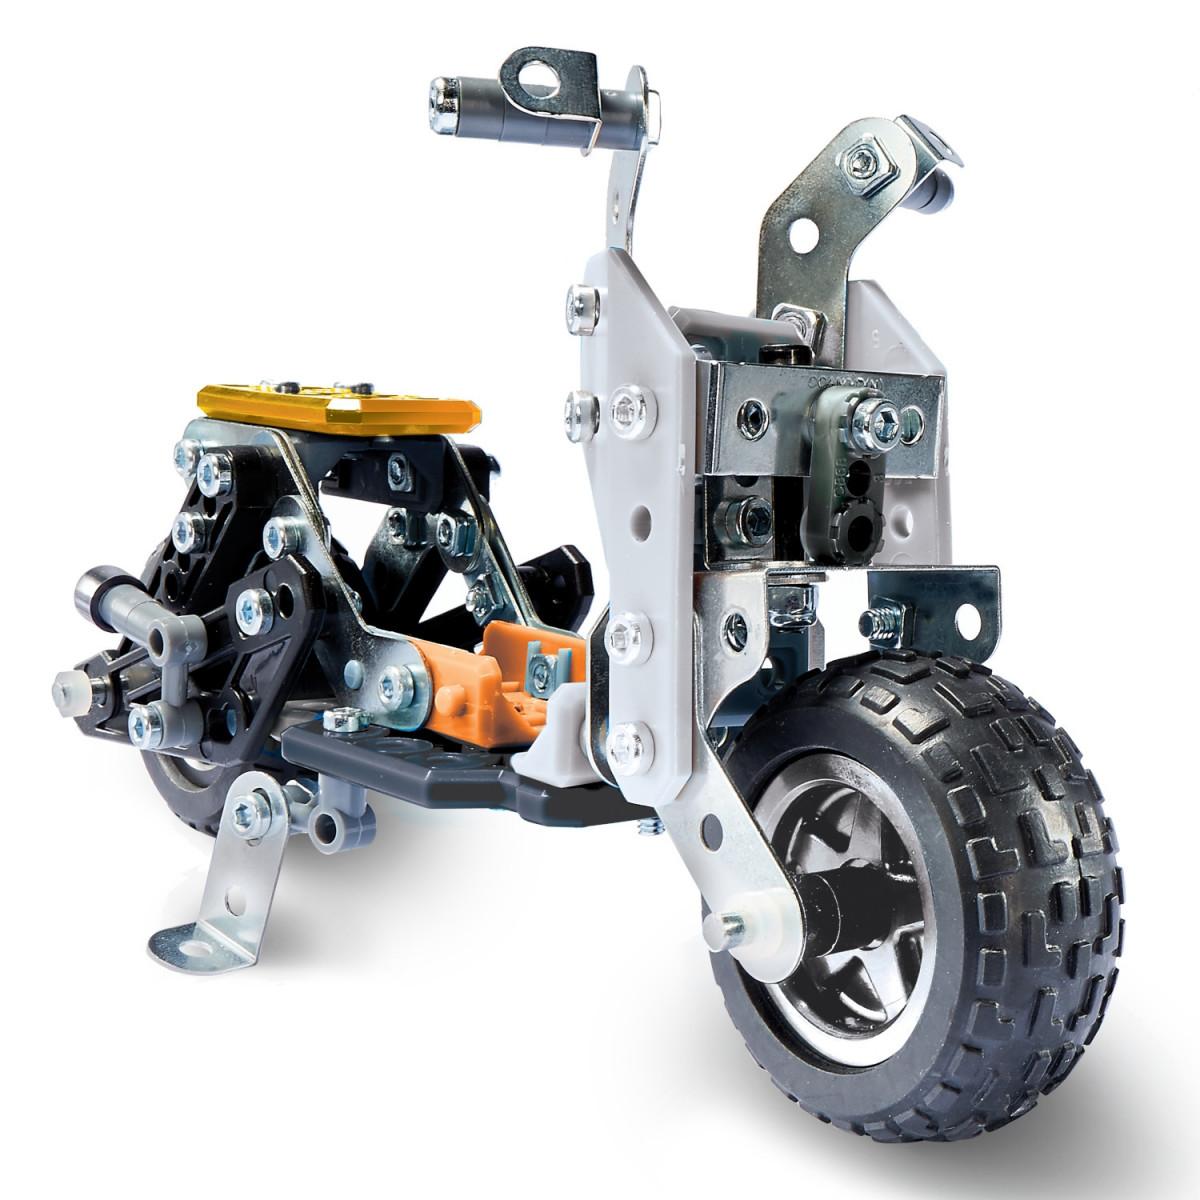 6052632 SUPER TRUCK 15 MODELES MECCANO MOTO